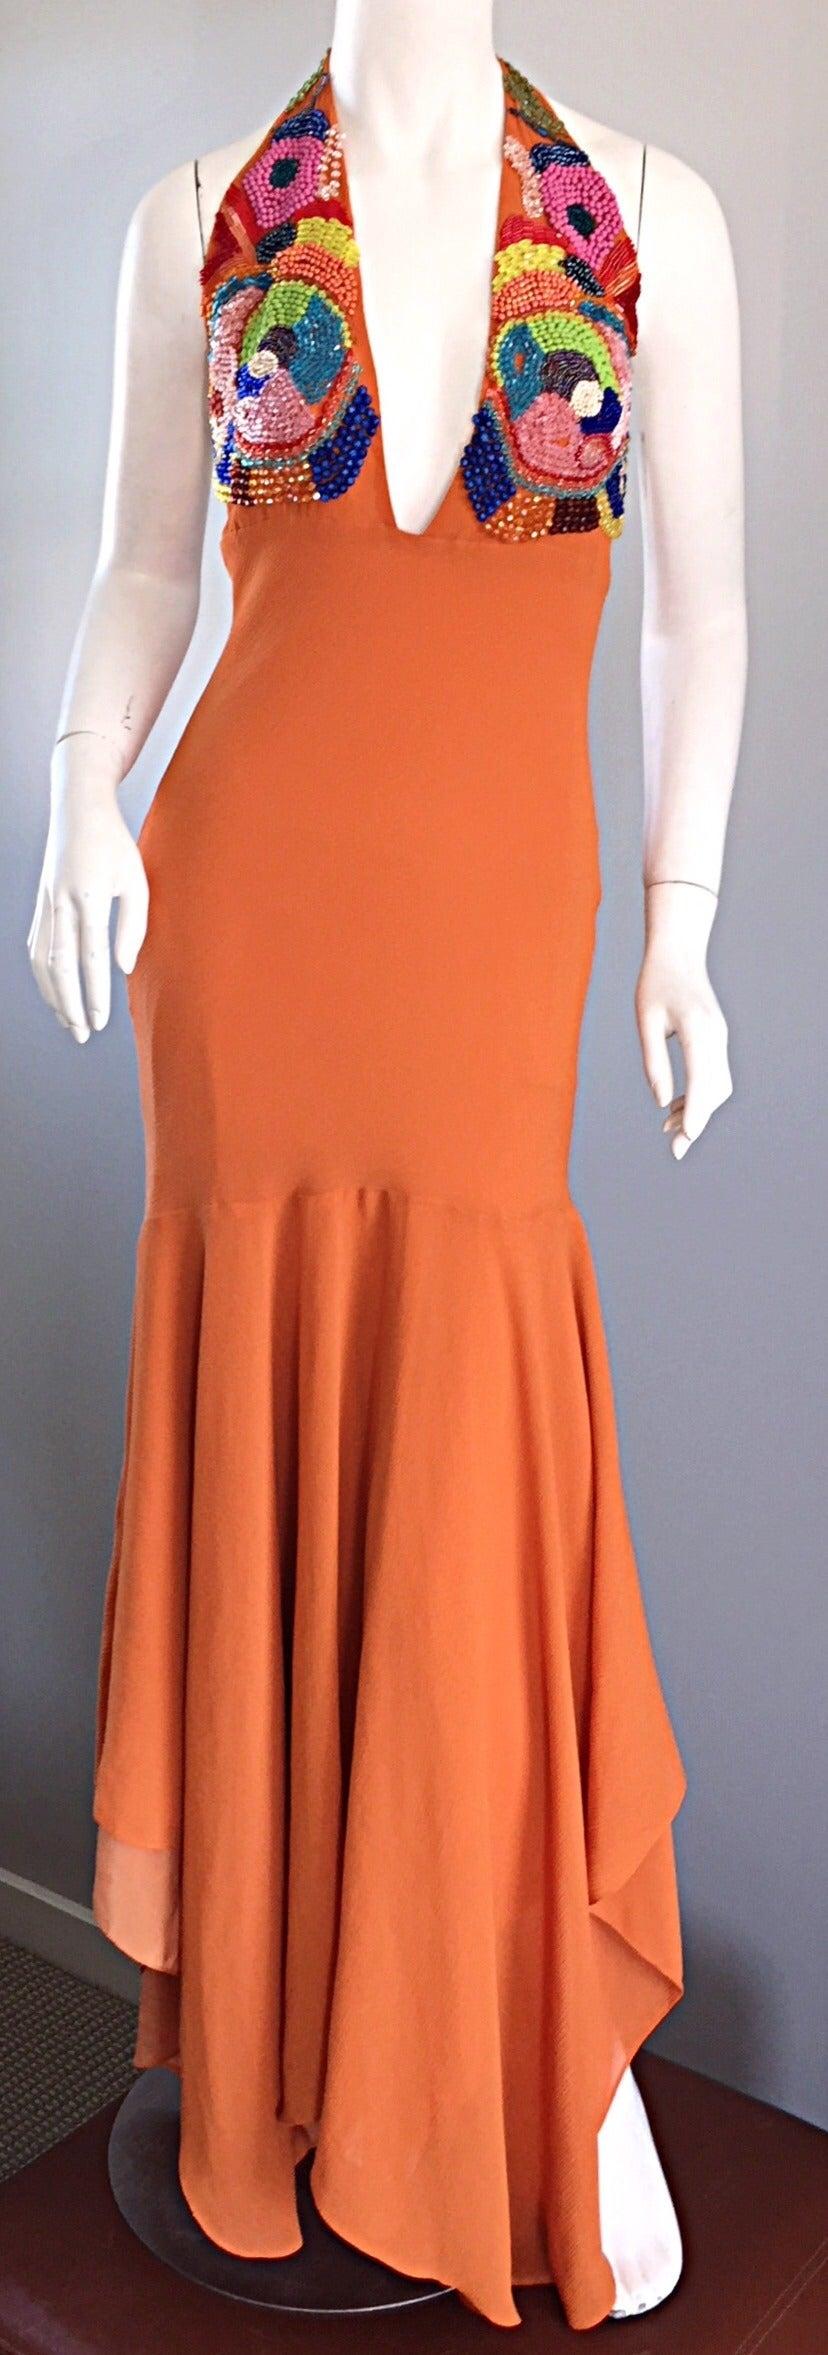 Sexy 1990s Silk Crepe Orange Mermaid Gown 90s Vintage Maxi Dress Vibrant Beading For Sale 3